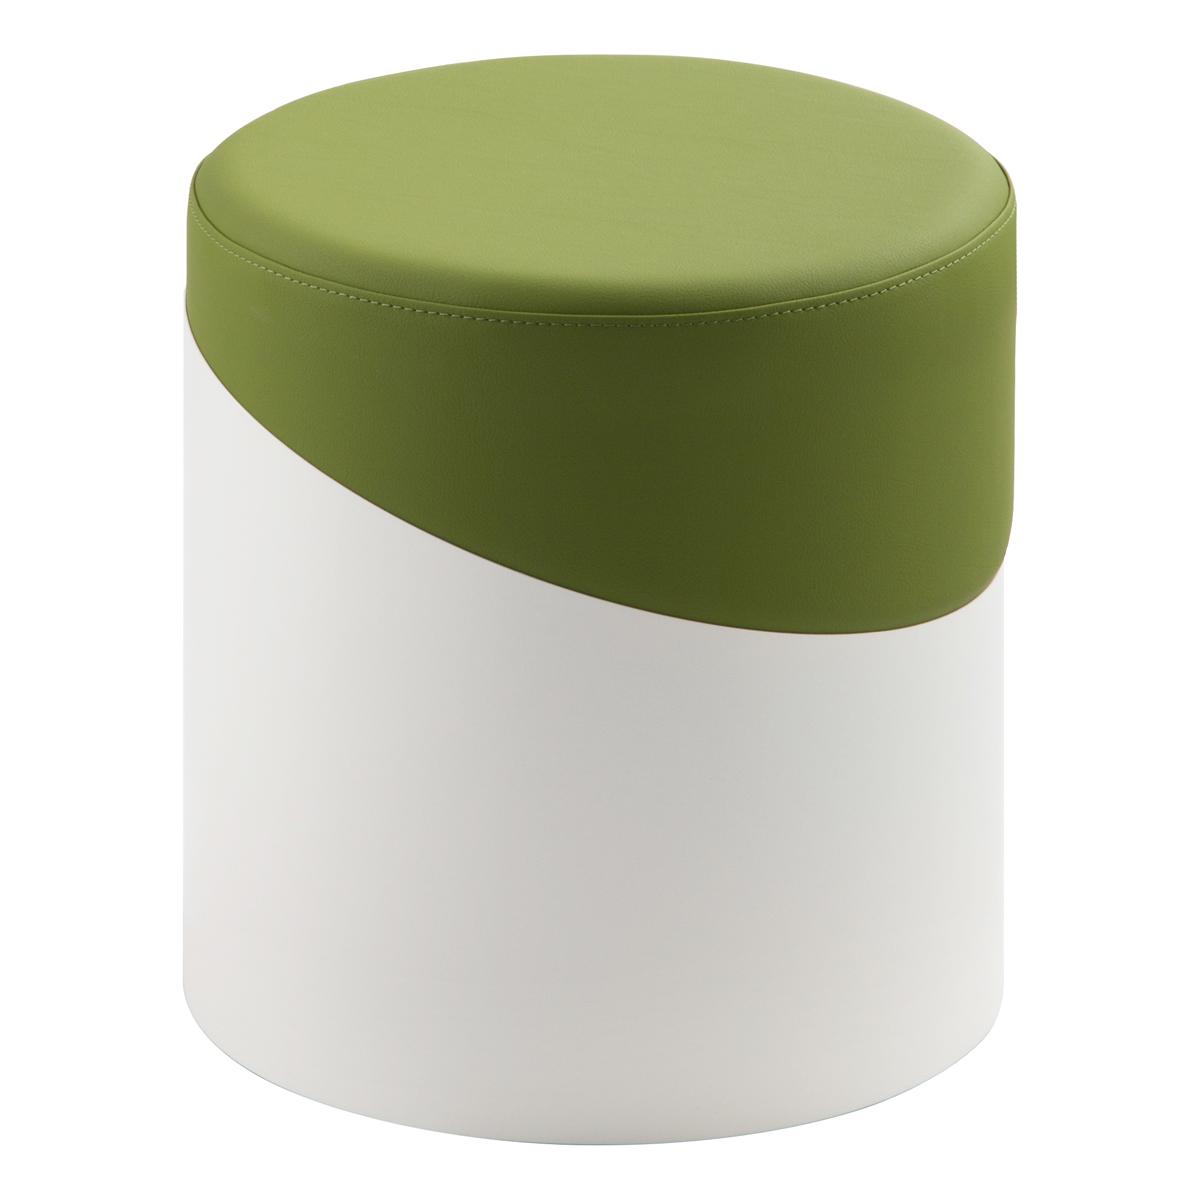 Hocker Nar, weiß-grün